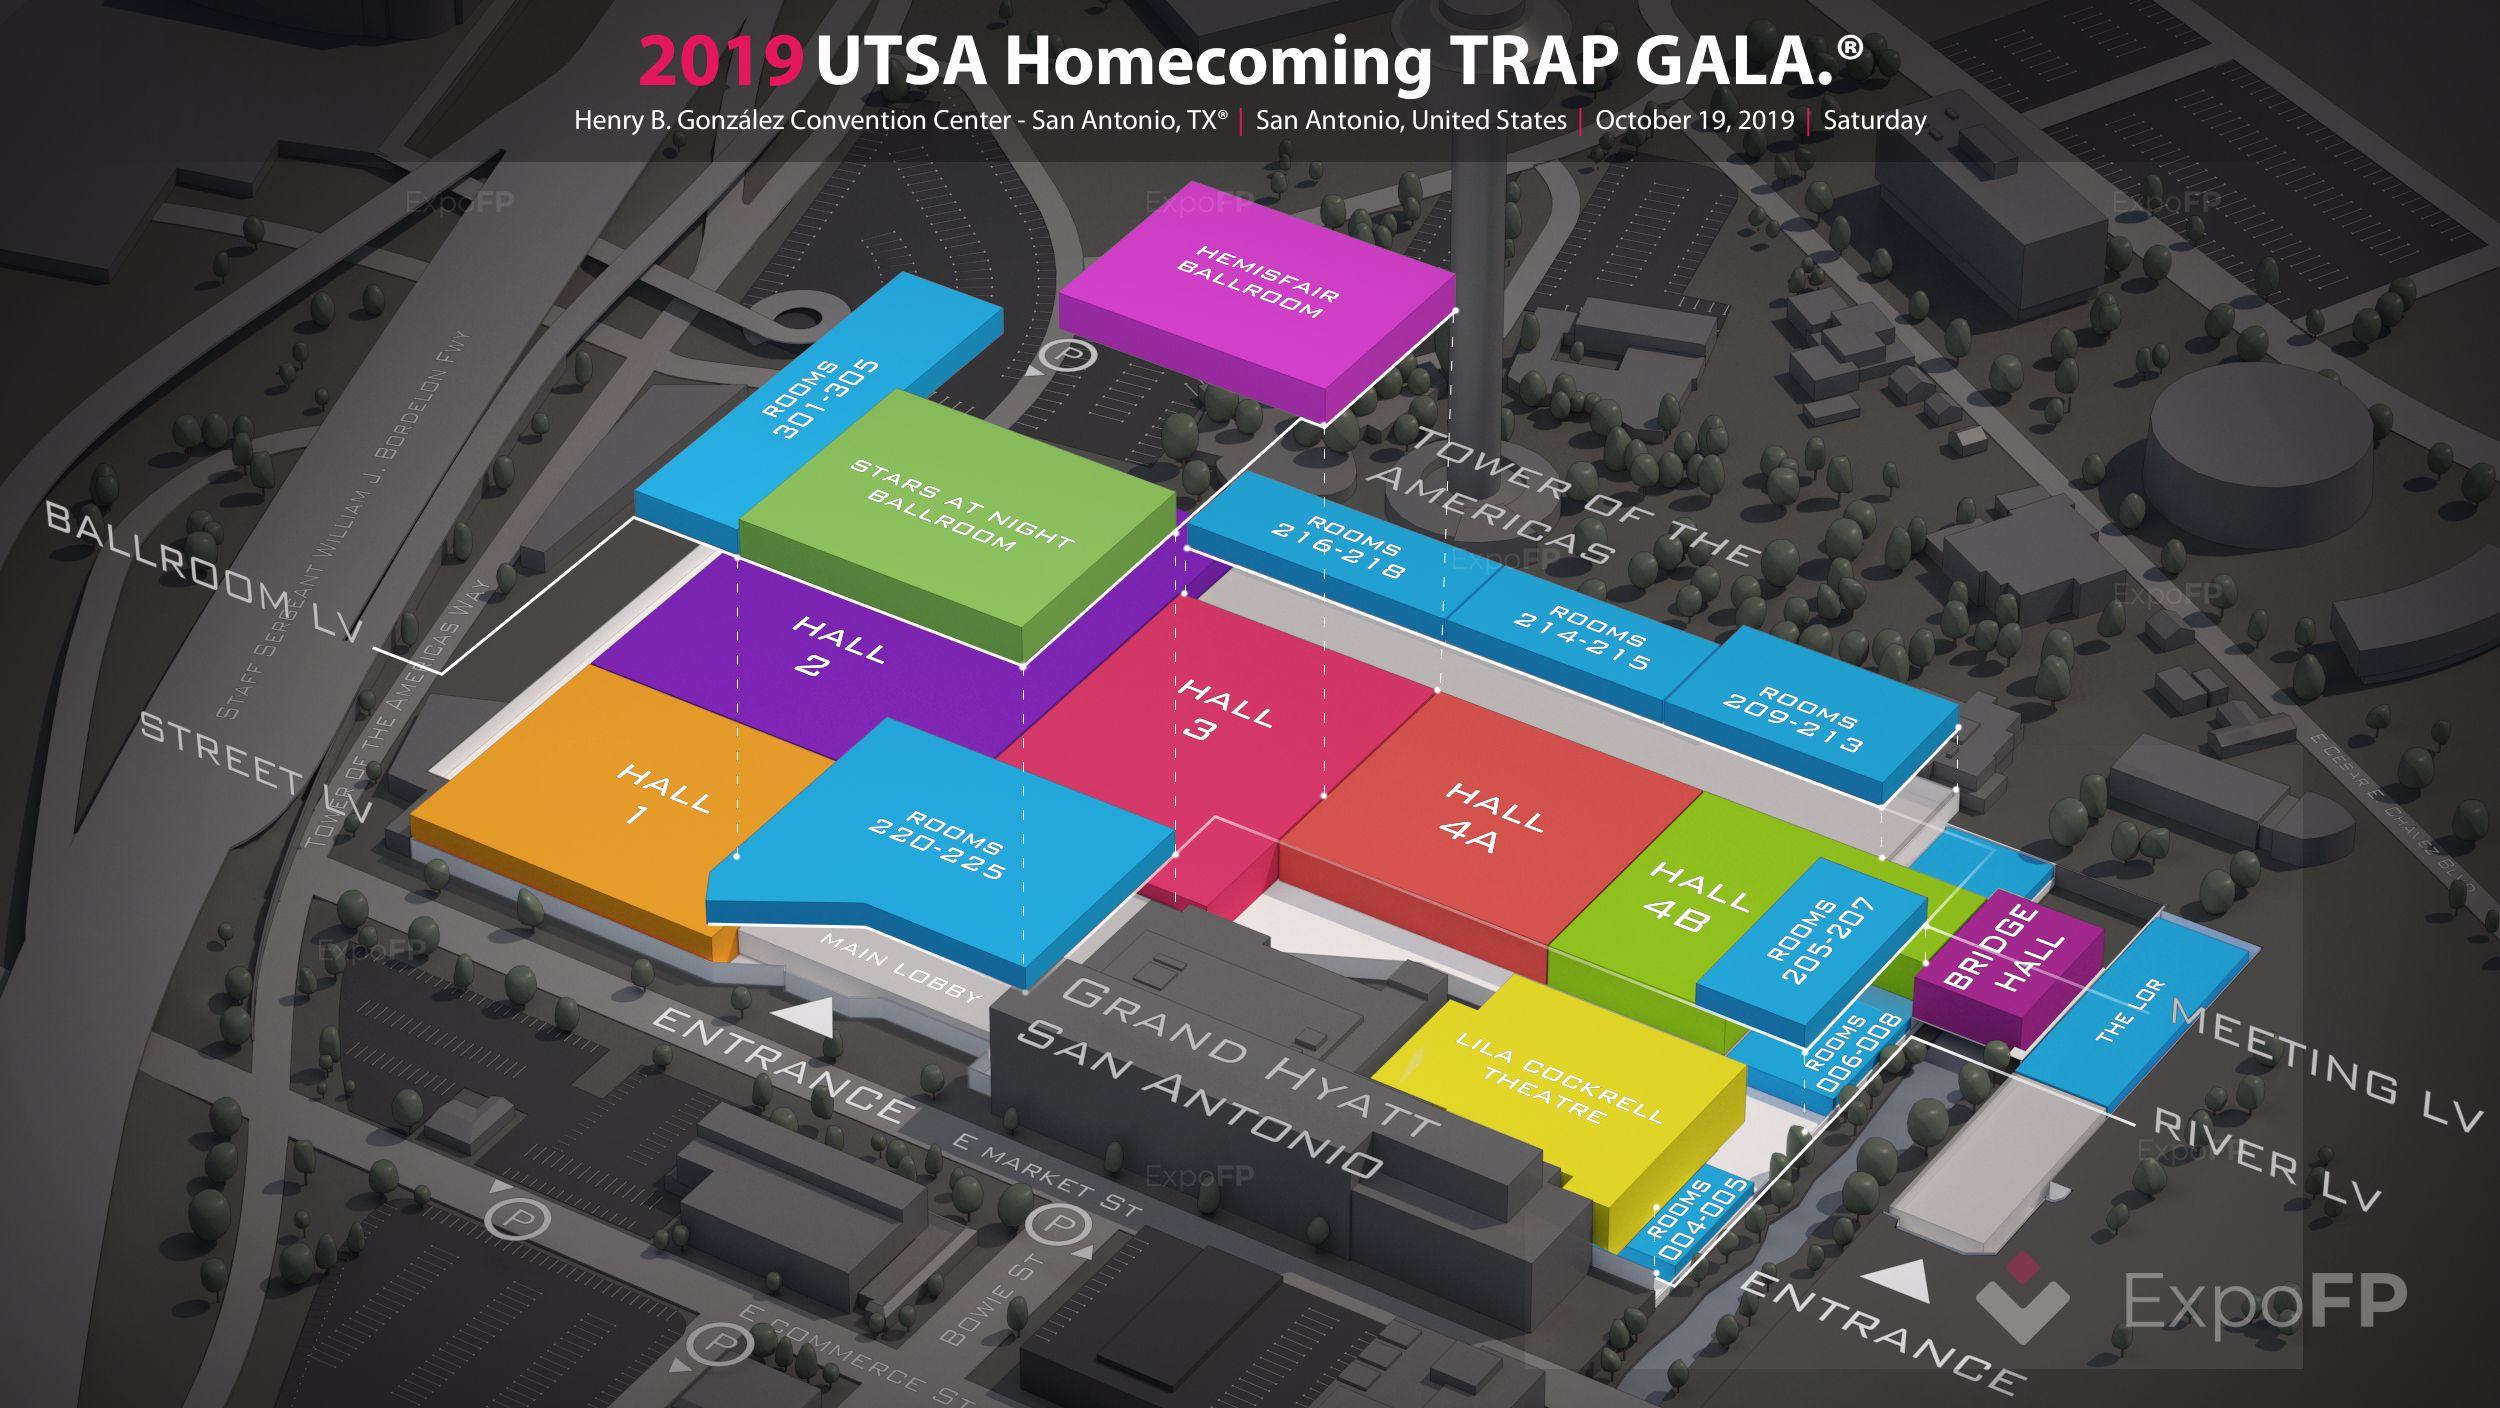 Utsa Graduation 2020.Utsa Homecoming Trap Gala 2019 In Henry B Gonzalez